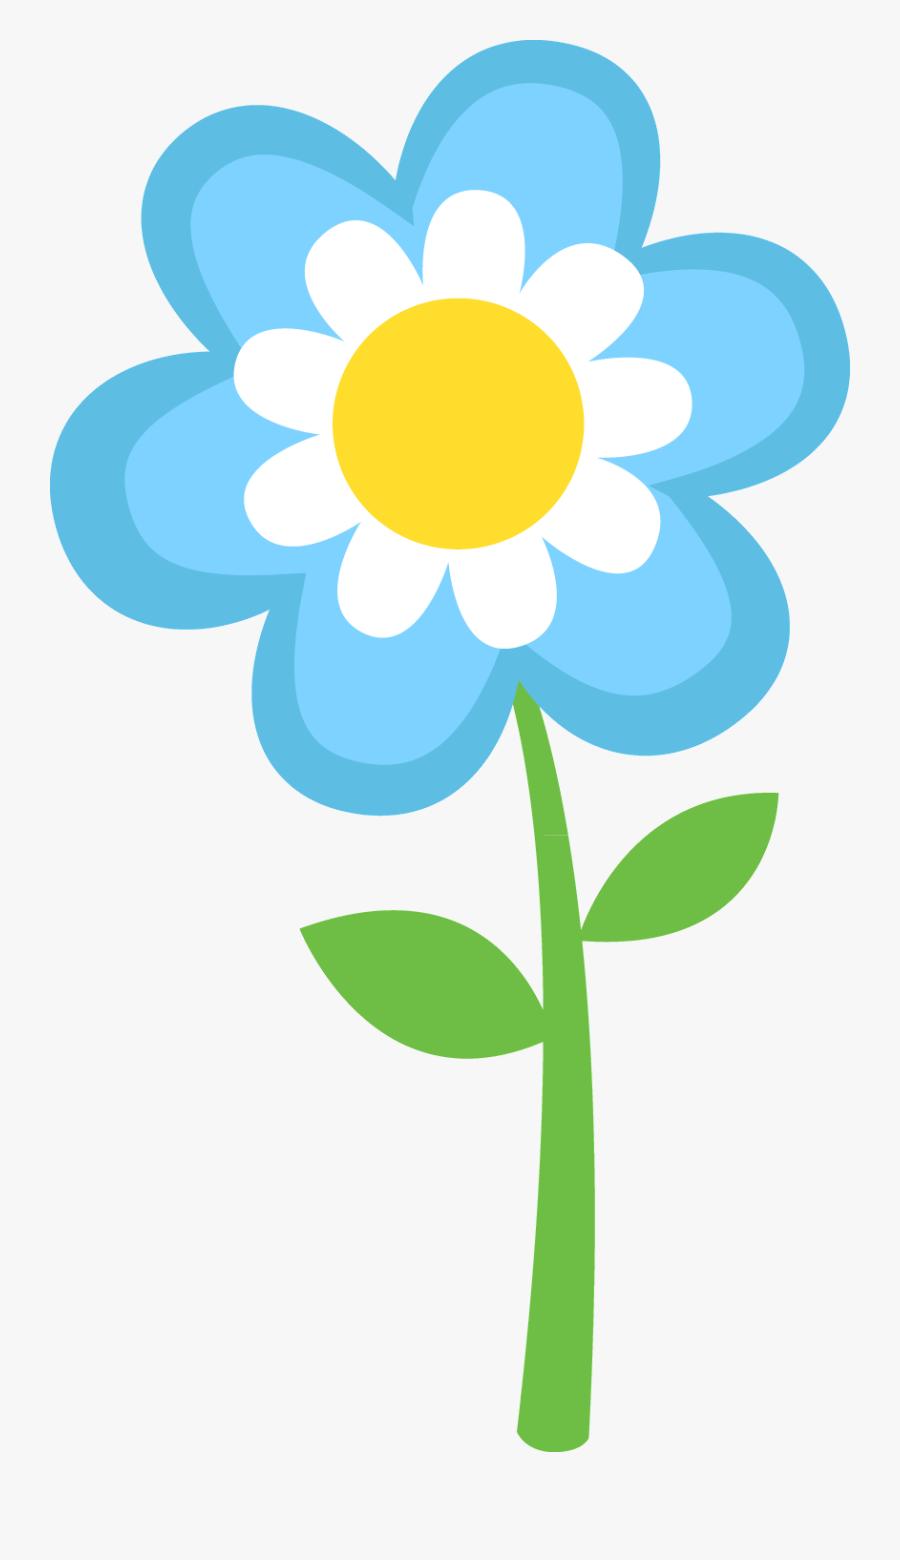 Transparent Spring Flowers Clipart.